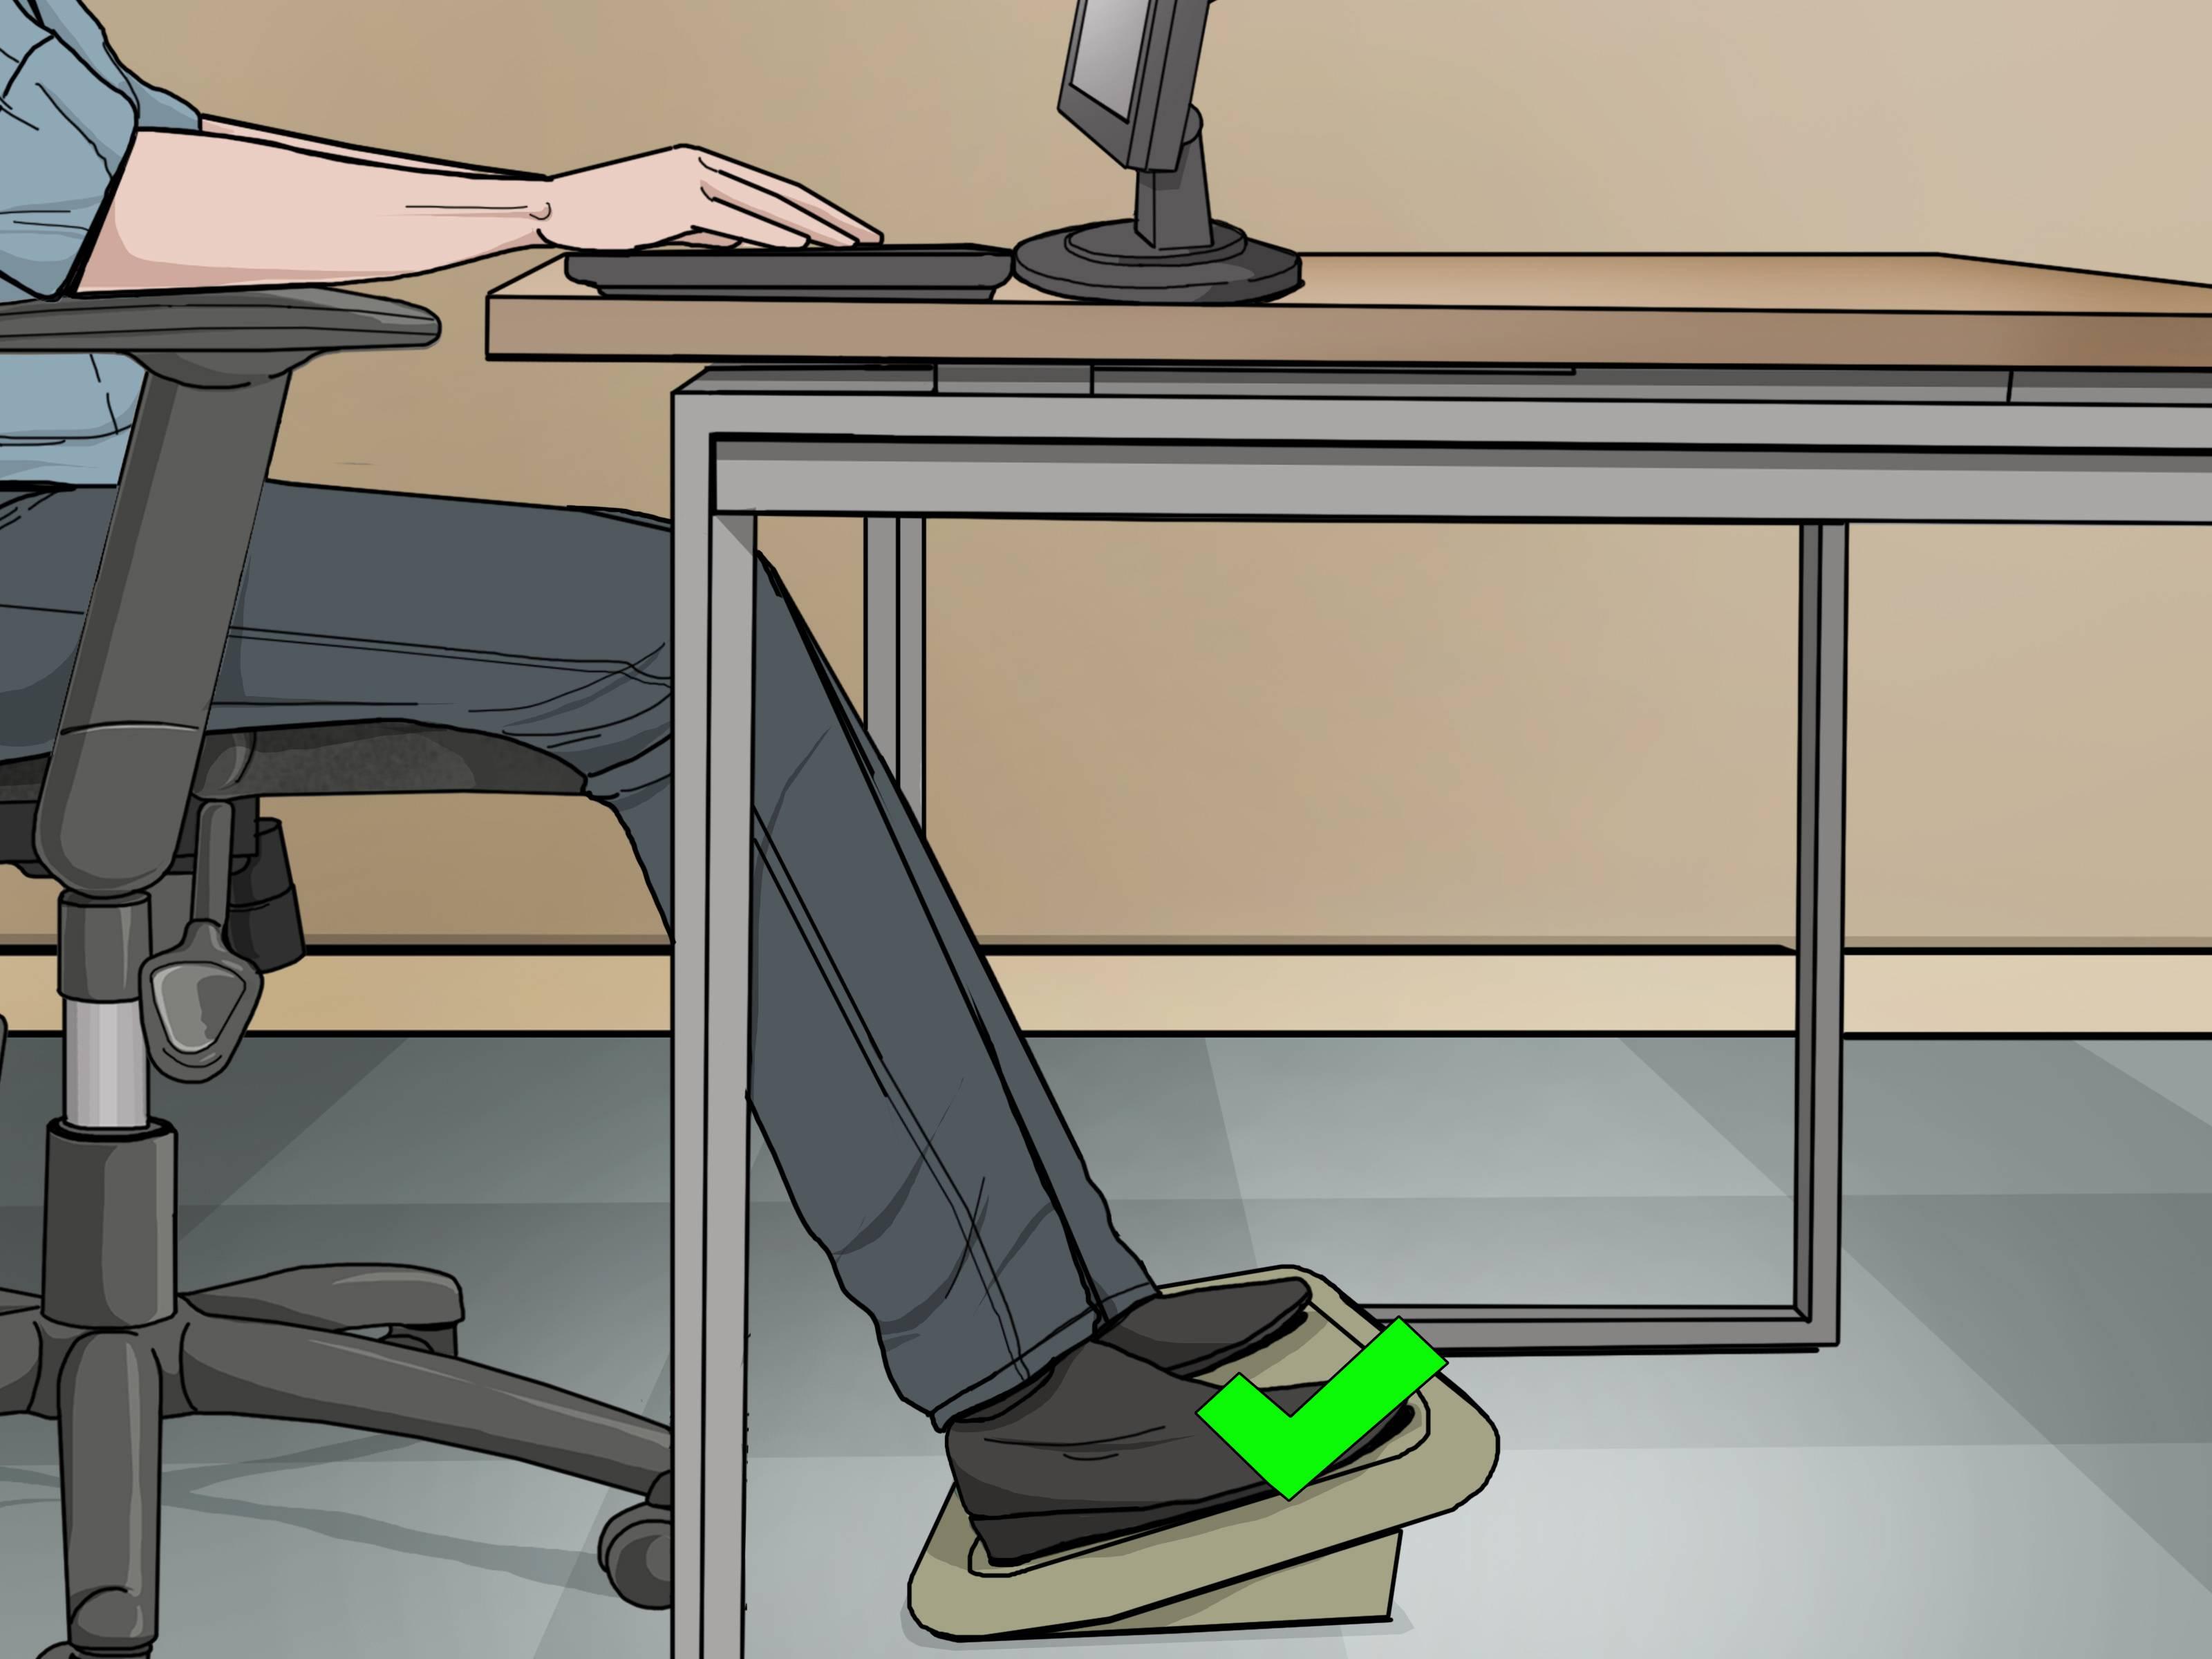 Adjust fice Chair Height Step 9